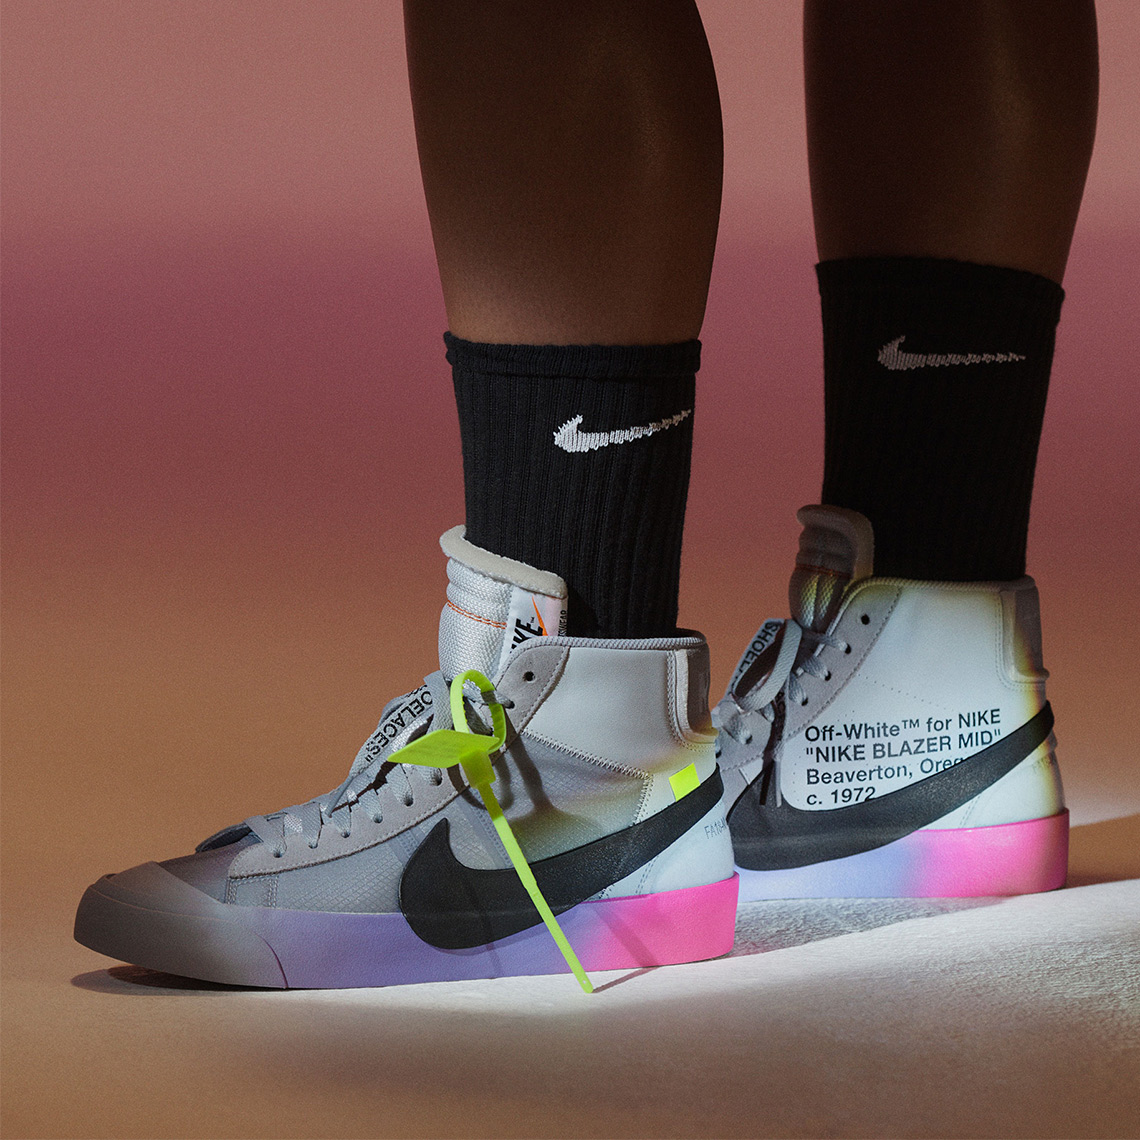 new product efc2e ff3a8 Off-White Virgil Abloh Serena Williams Nike Air Max 97 + Blazer ...